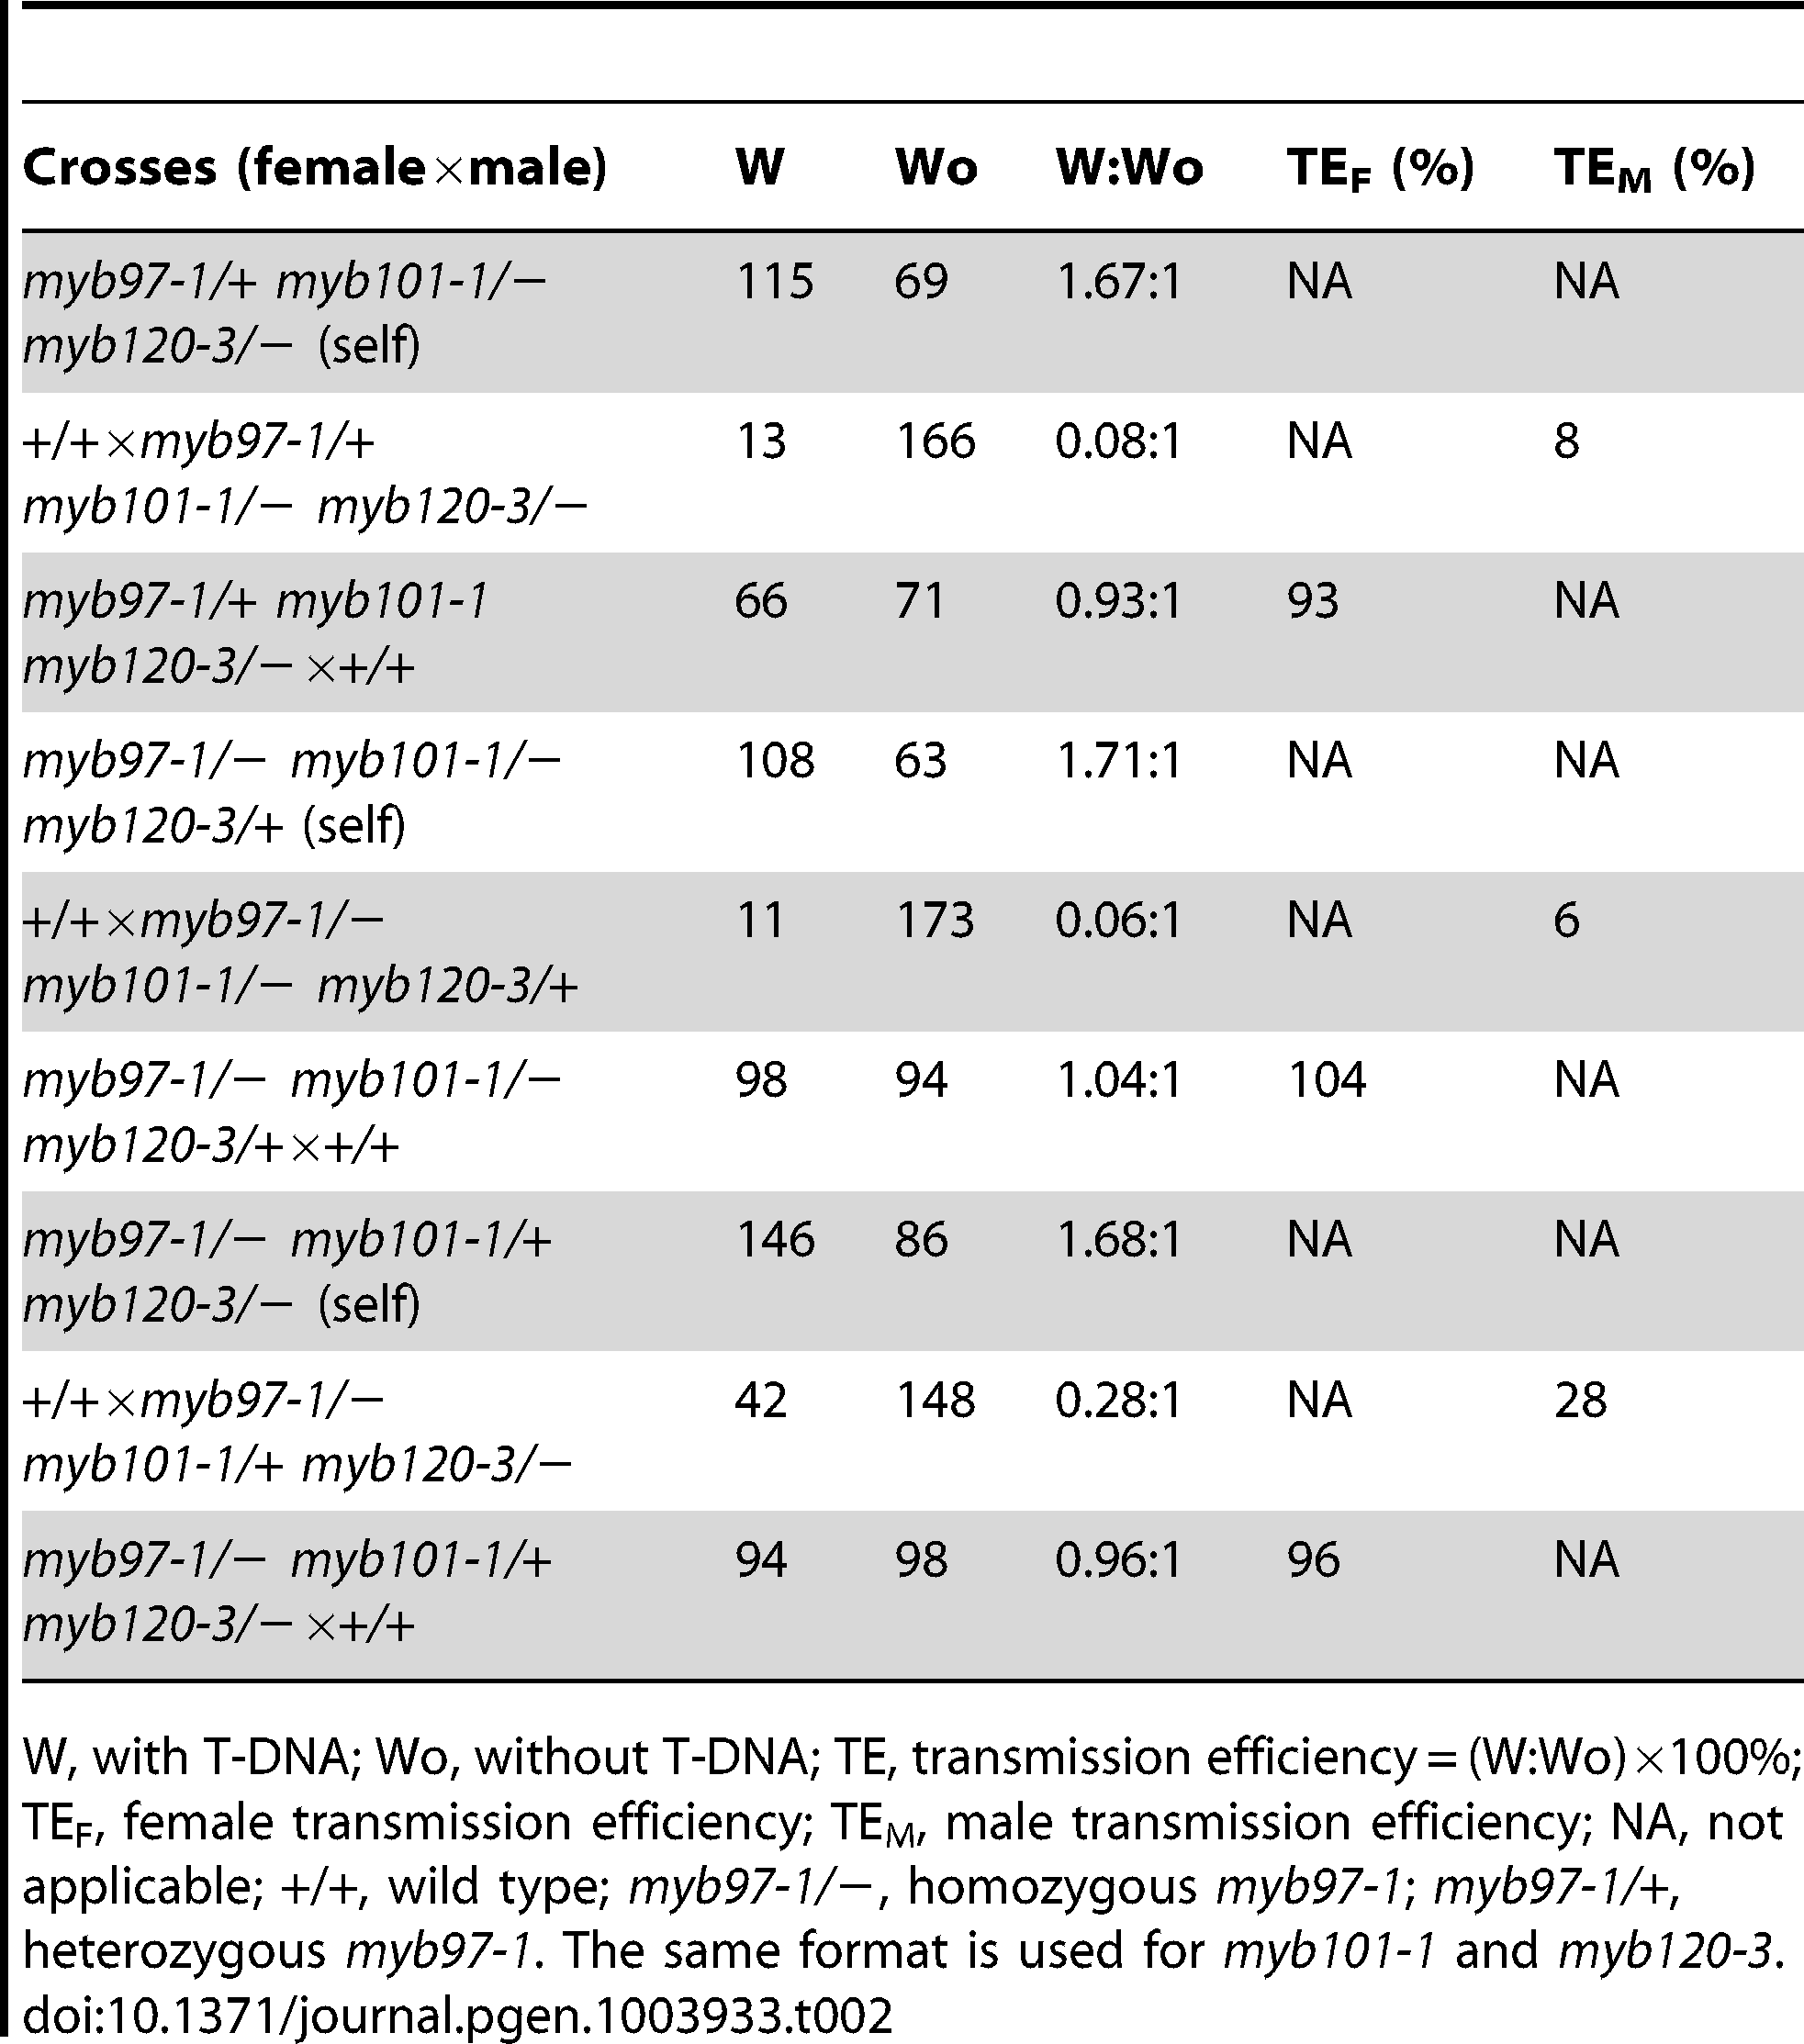 Genetic analysis of <i>myb97-1 myb101-1 myb120-3</i> heterozygous mutants.